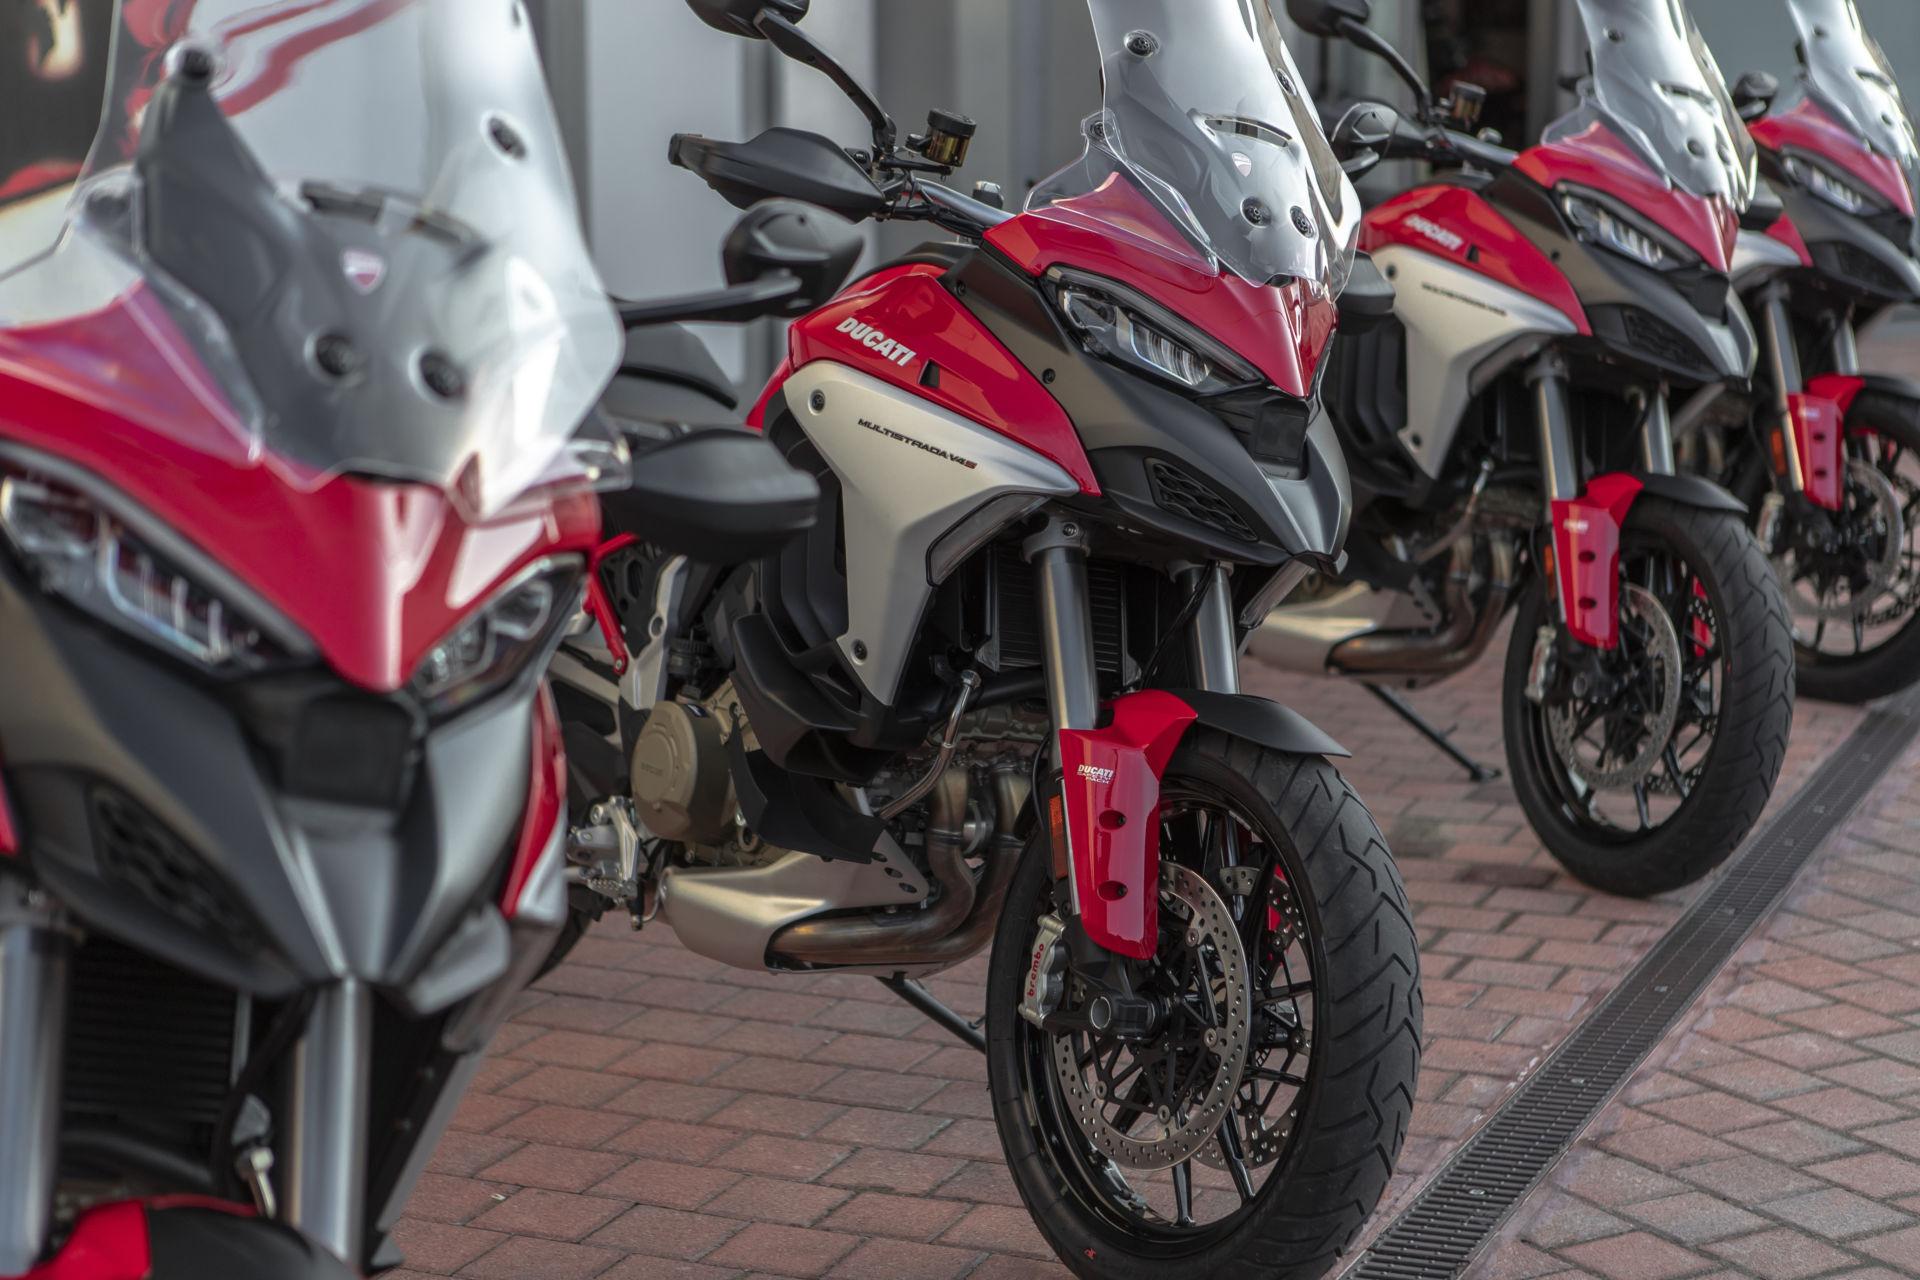 Ducati Multistrada V4 S motorcycles. Photo courtesy Ducati.